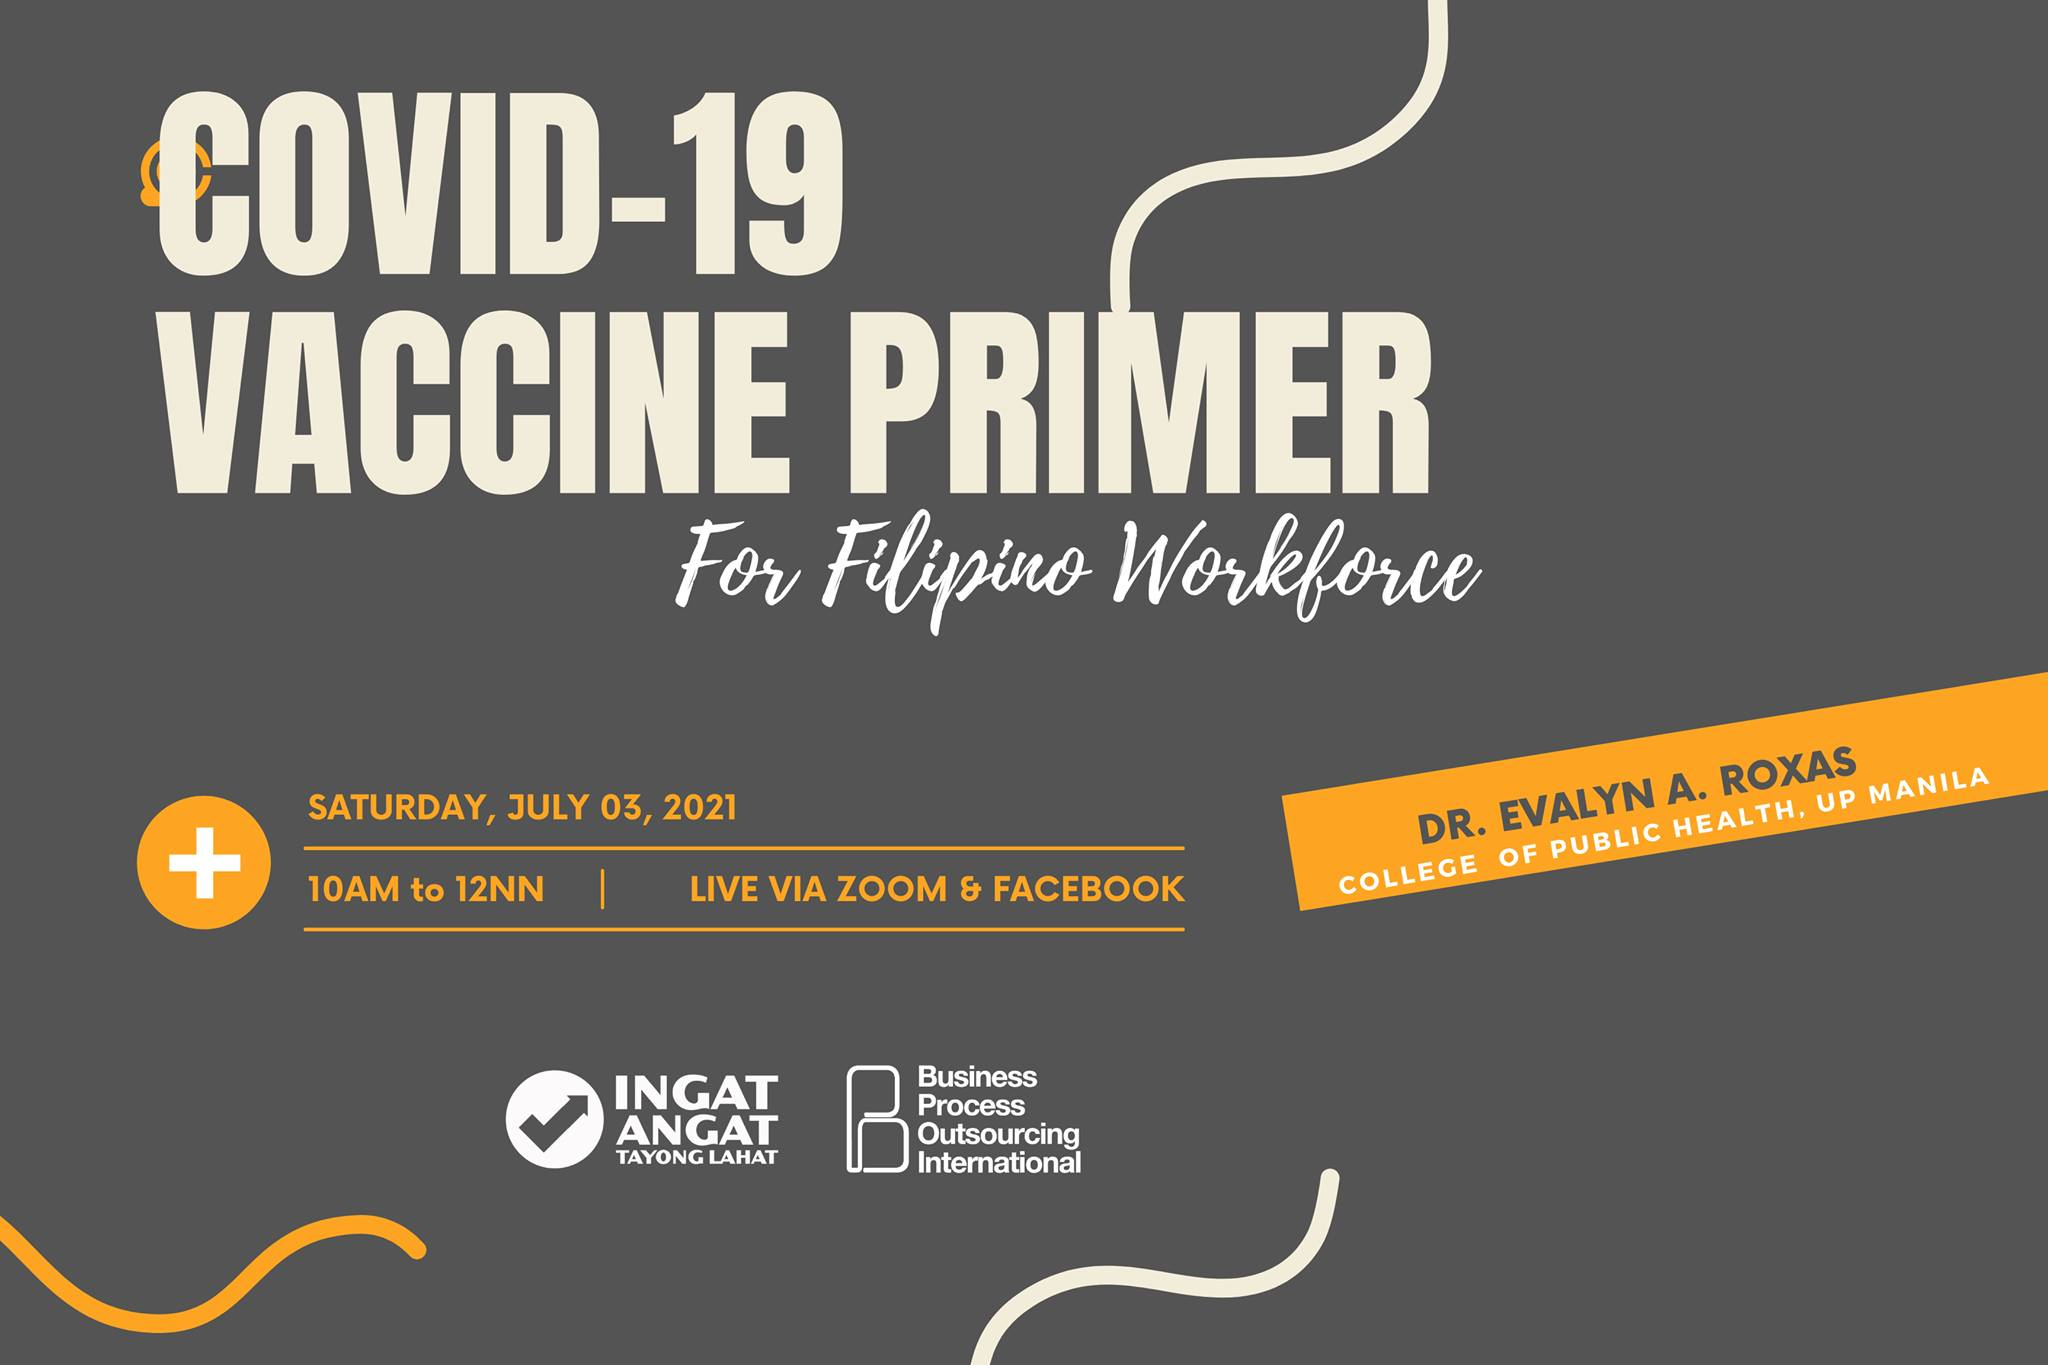 COVID-19 VACCINE PRIMER For Filipino Workforce via @joinlcac